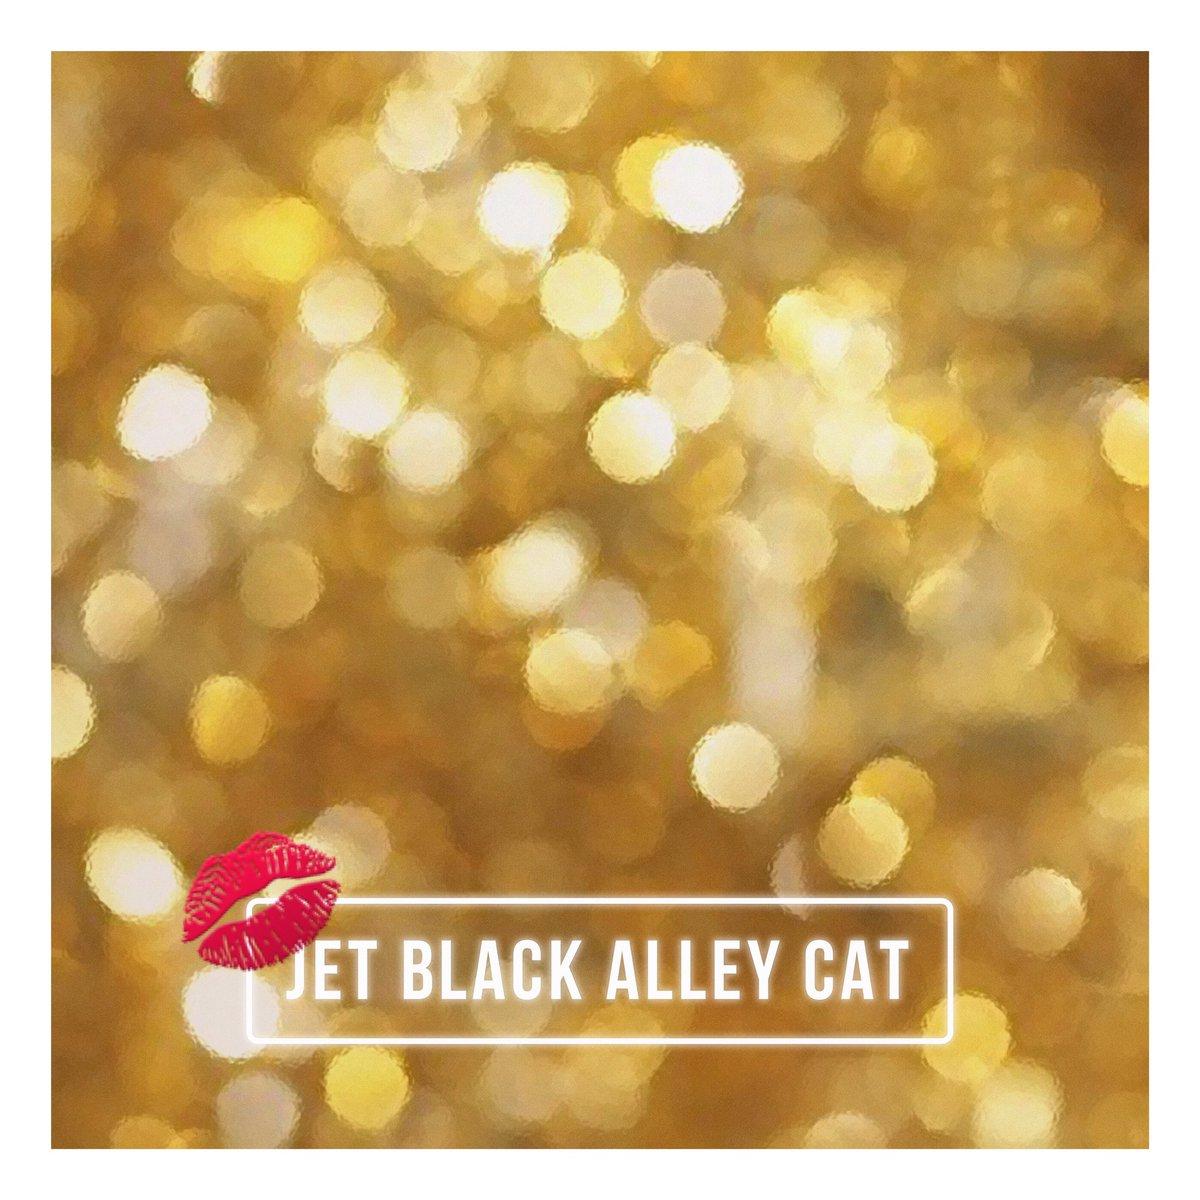 Jet Black Alley Cat Golden